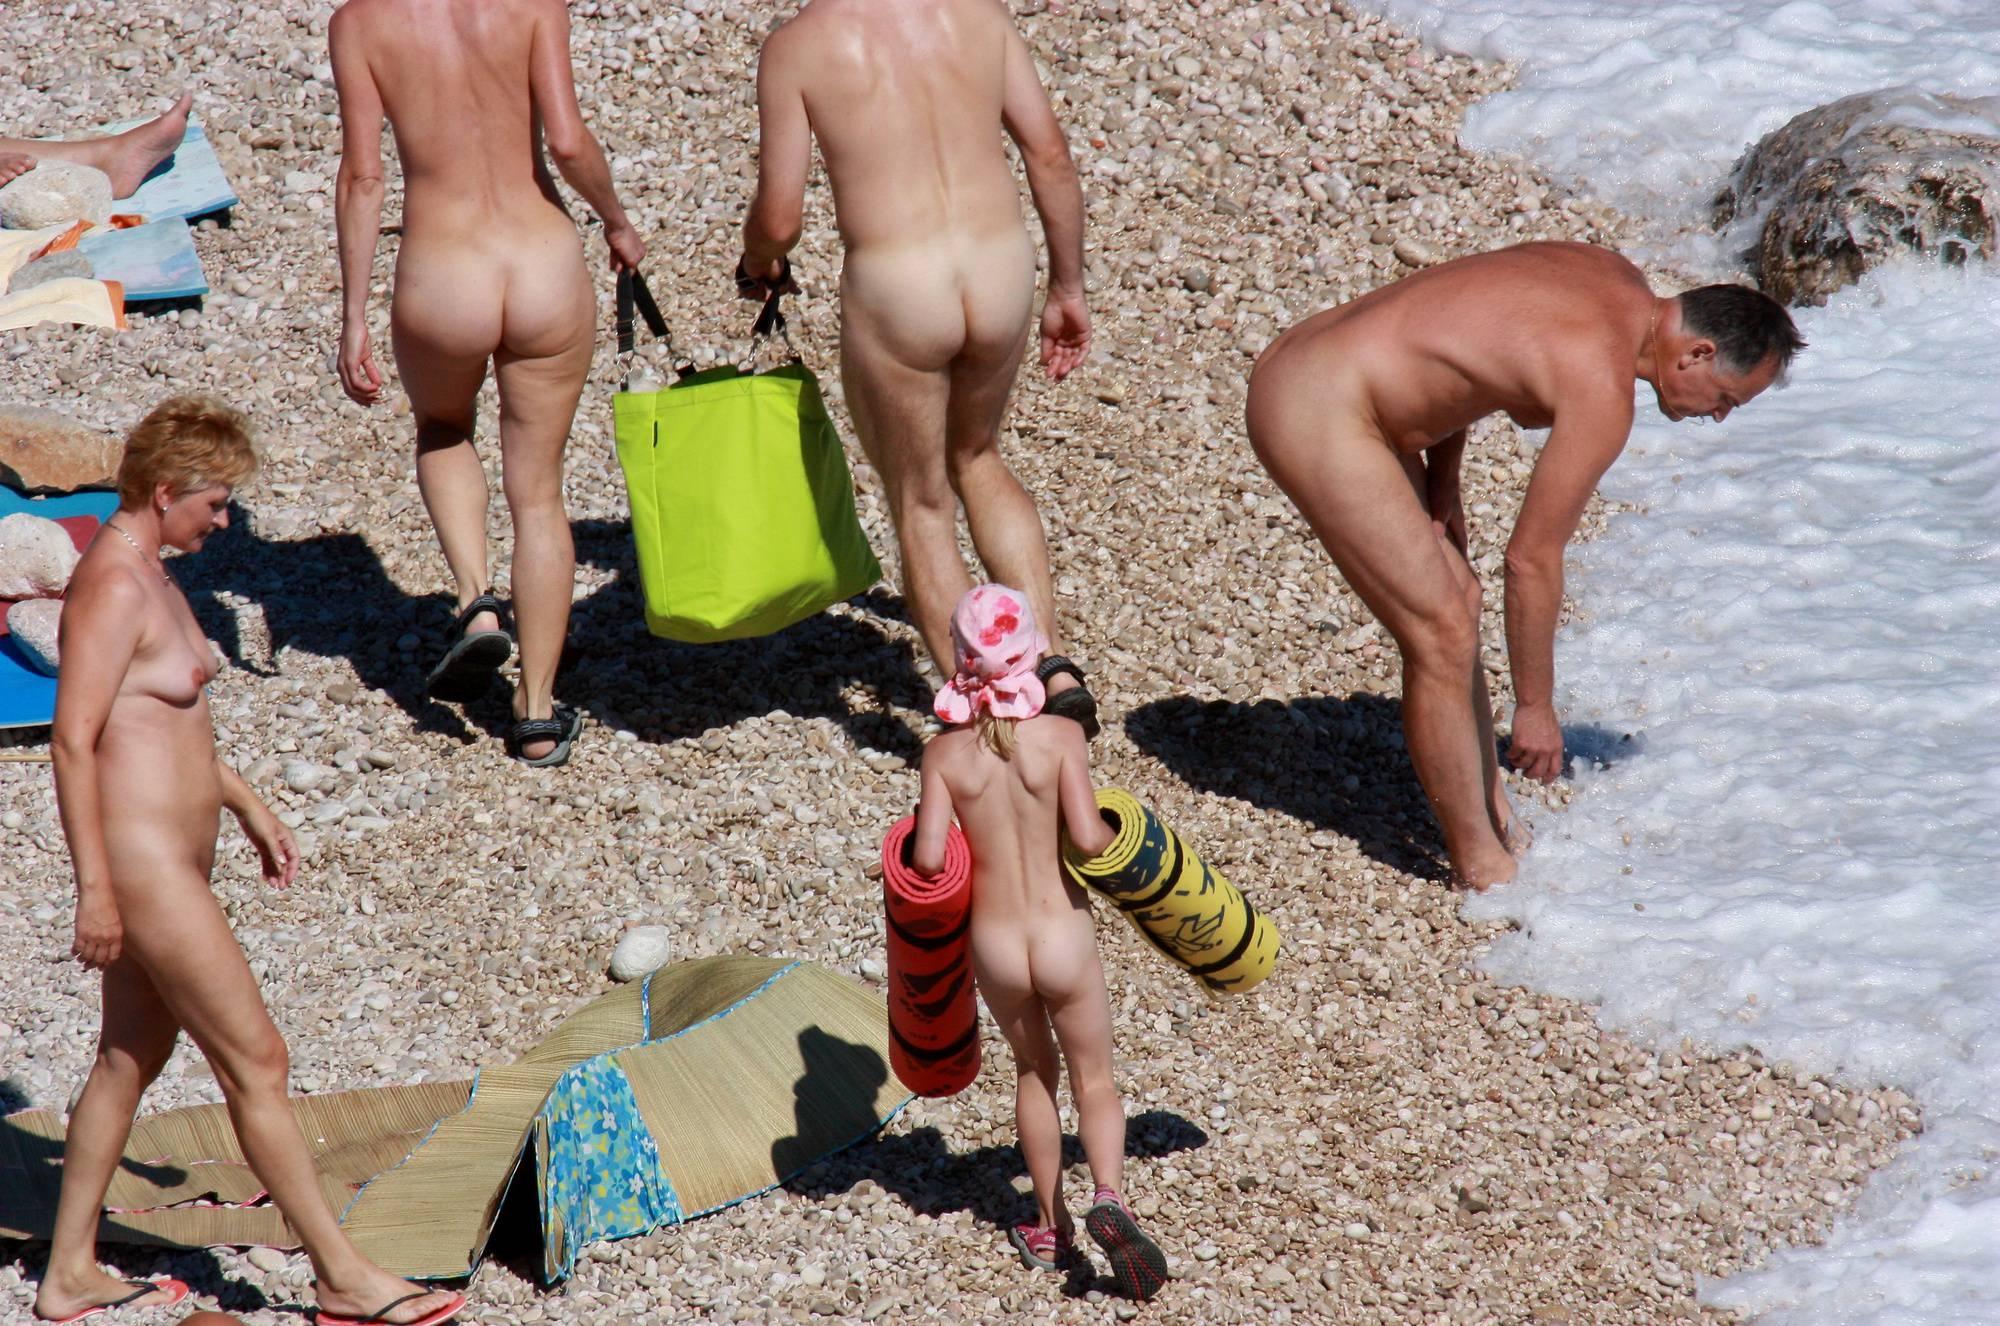 Nudist Family Deportation - 2